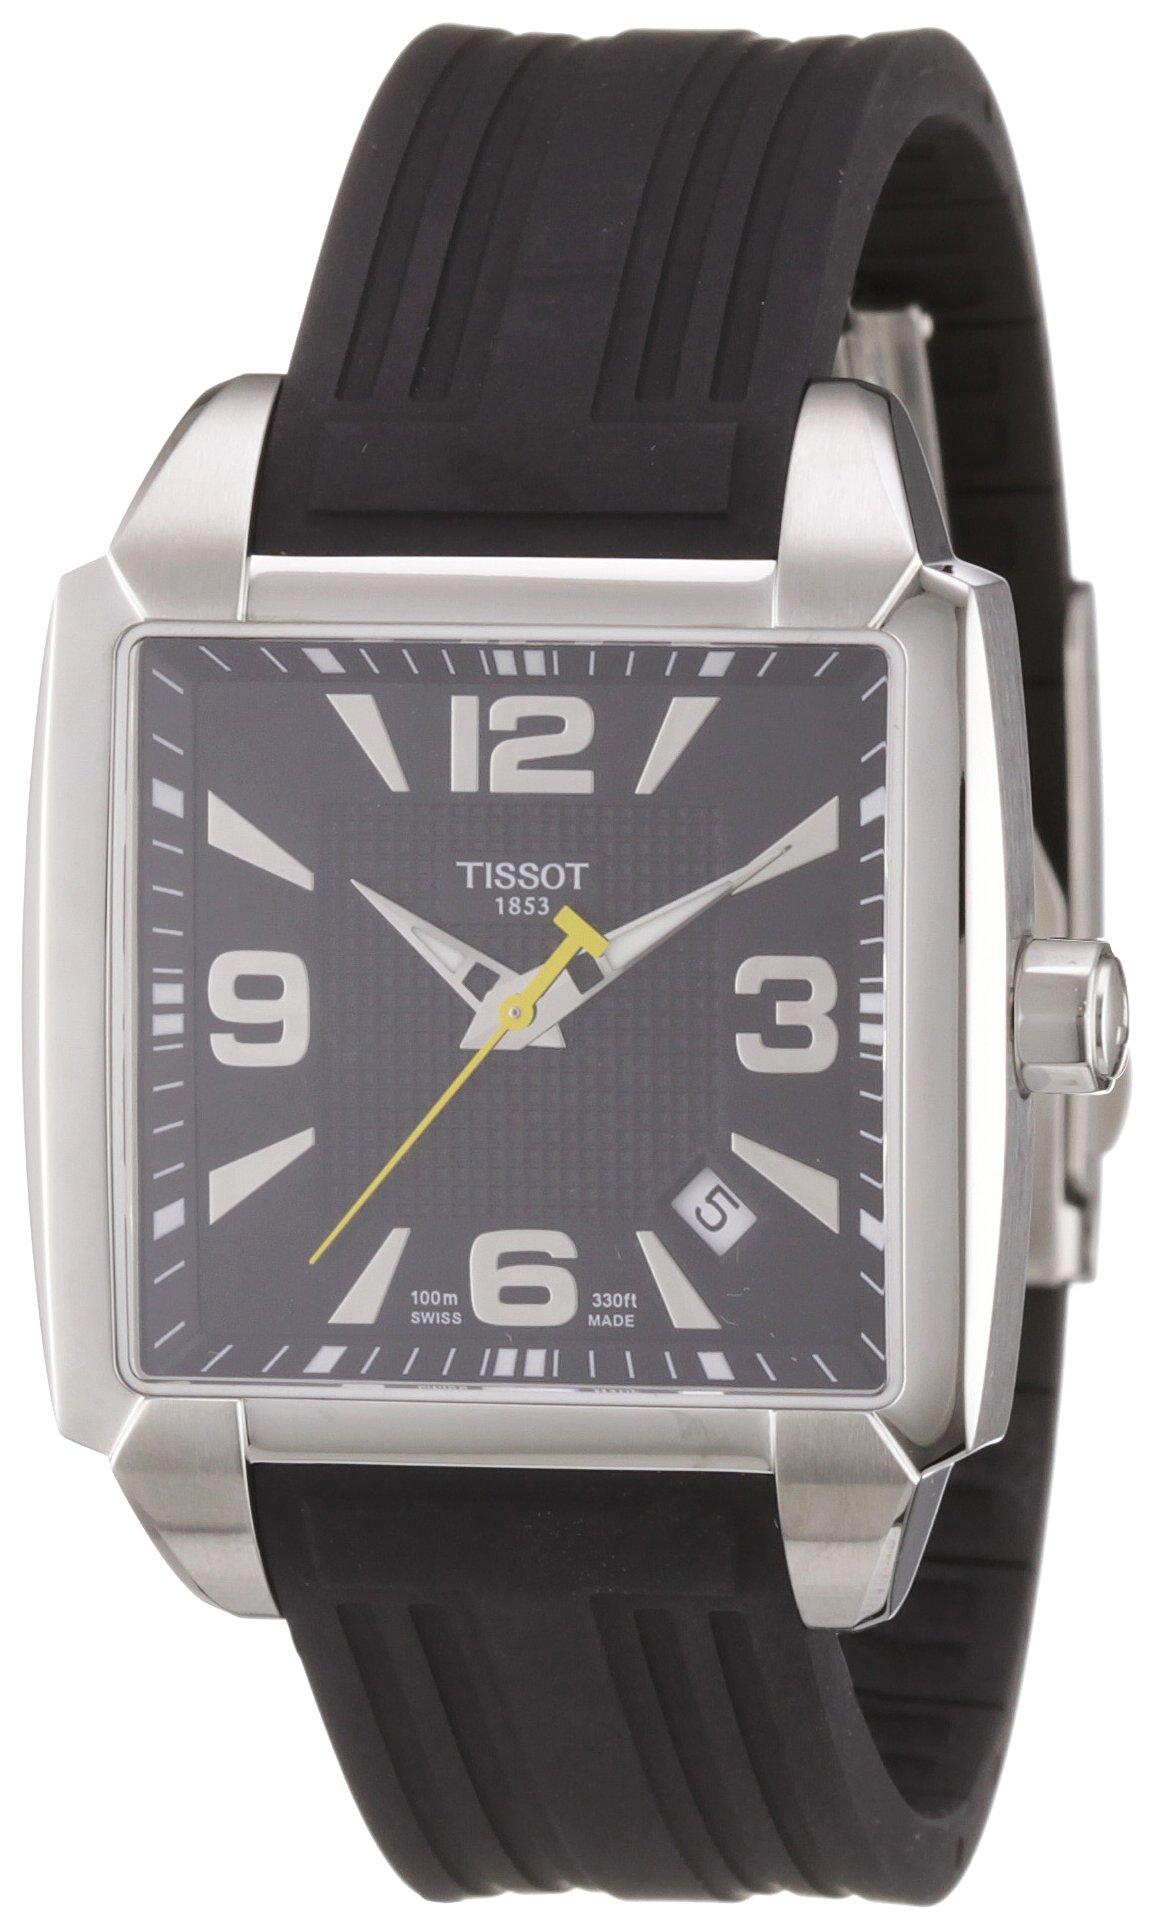 Tissot T QUADRATO – Reloj analógico de caballero de cuarzo con correa de goma negra